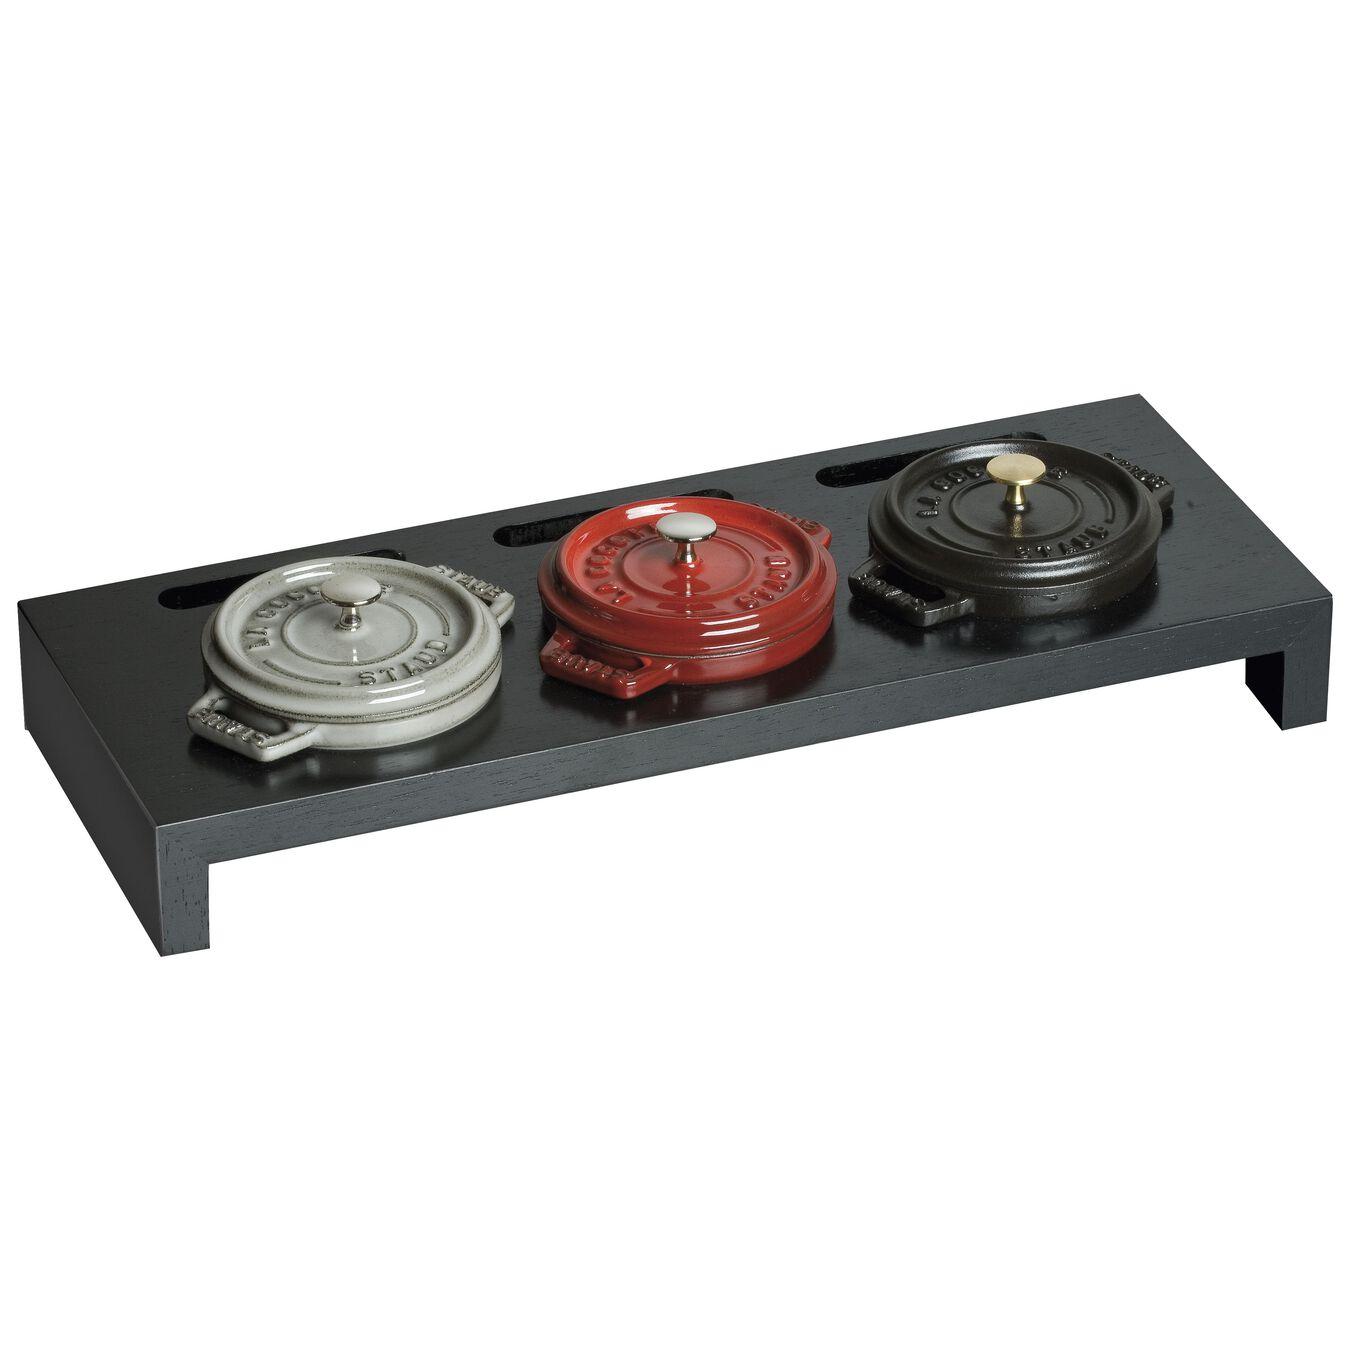 Fiber wood, Mini Cocotte Stand, black matte,,large 1